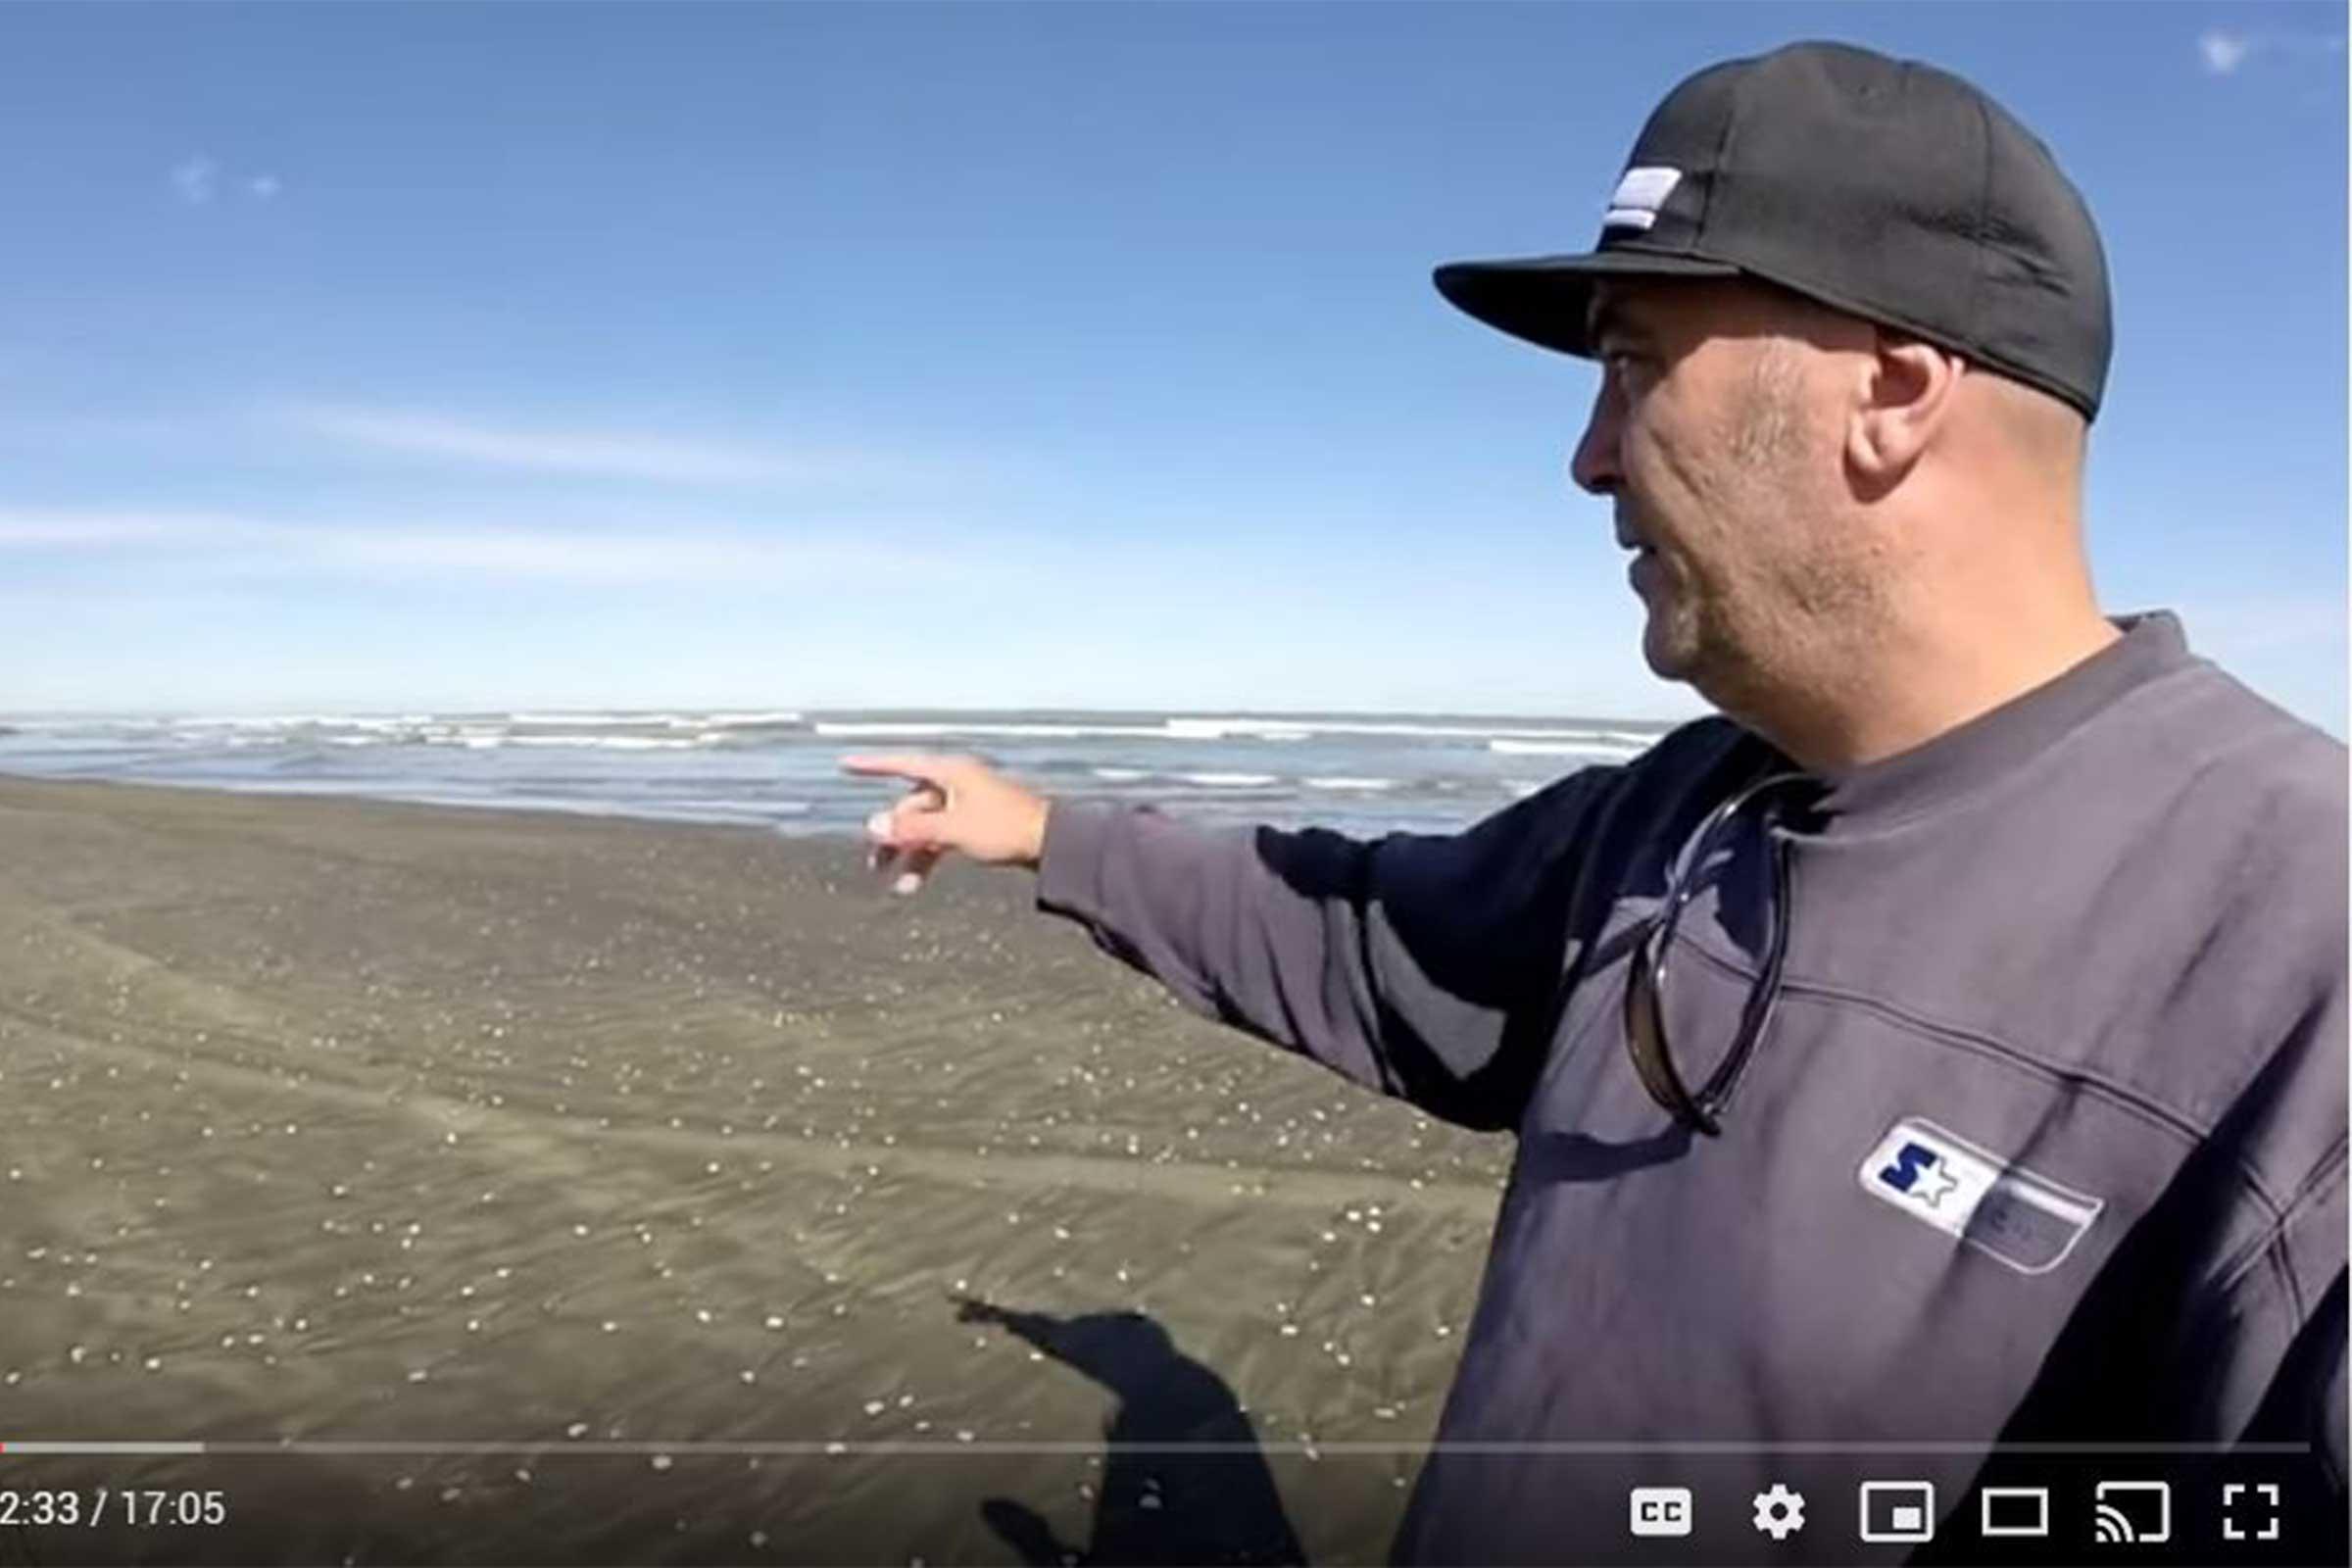 Surfcasting Muriwai Beach - Tips and tricks